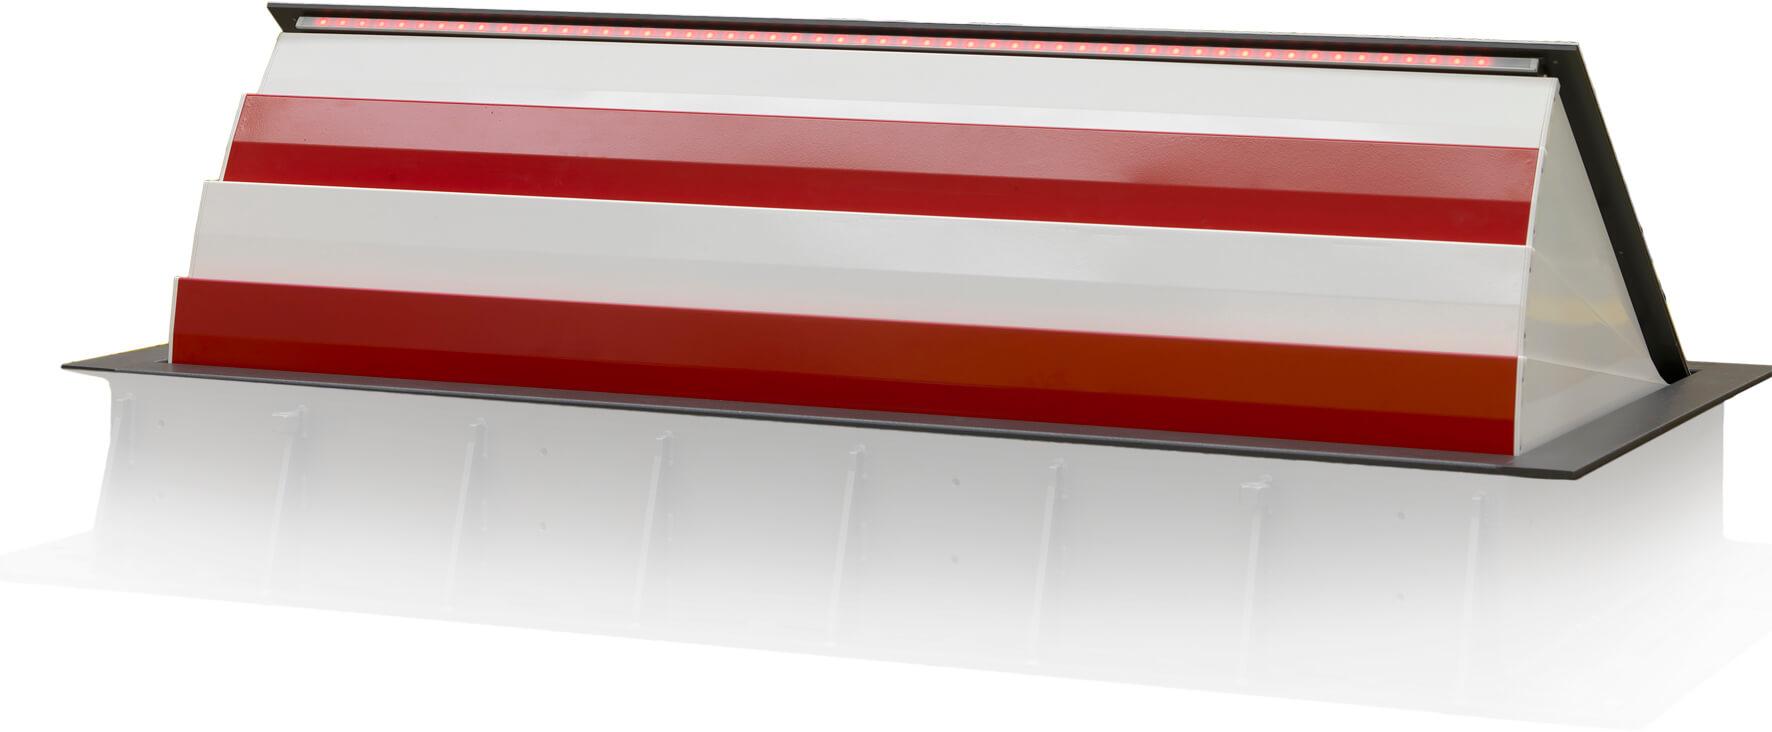 Vägspärr RSB M30